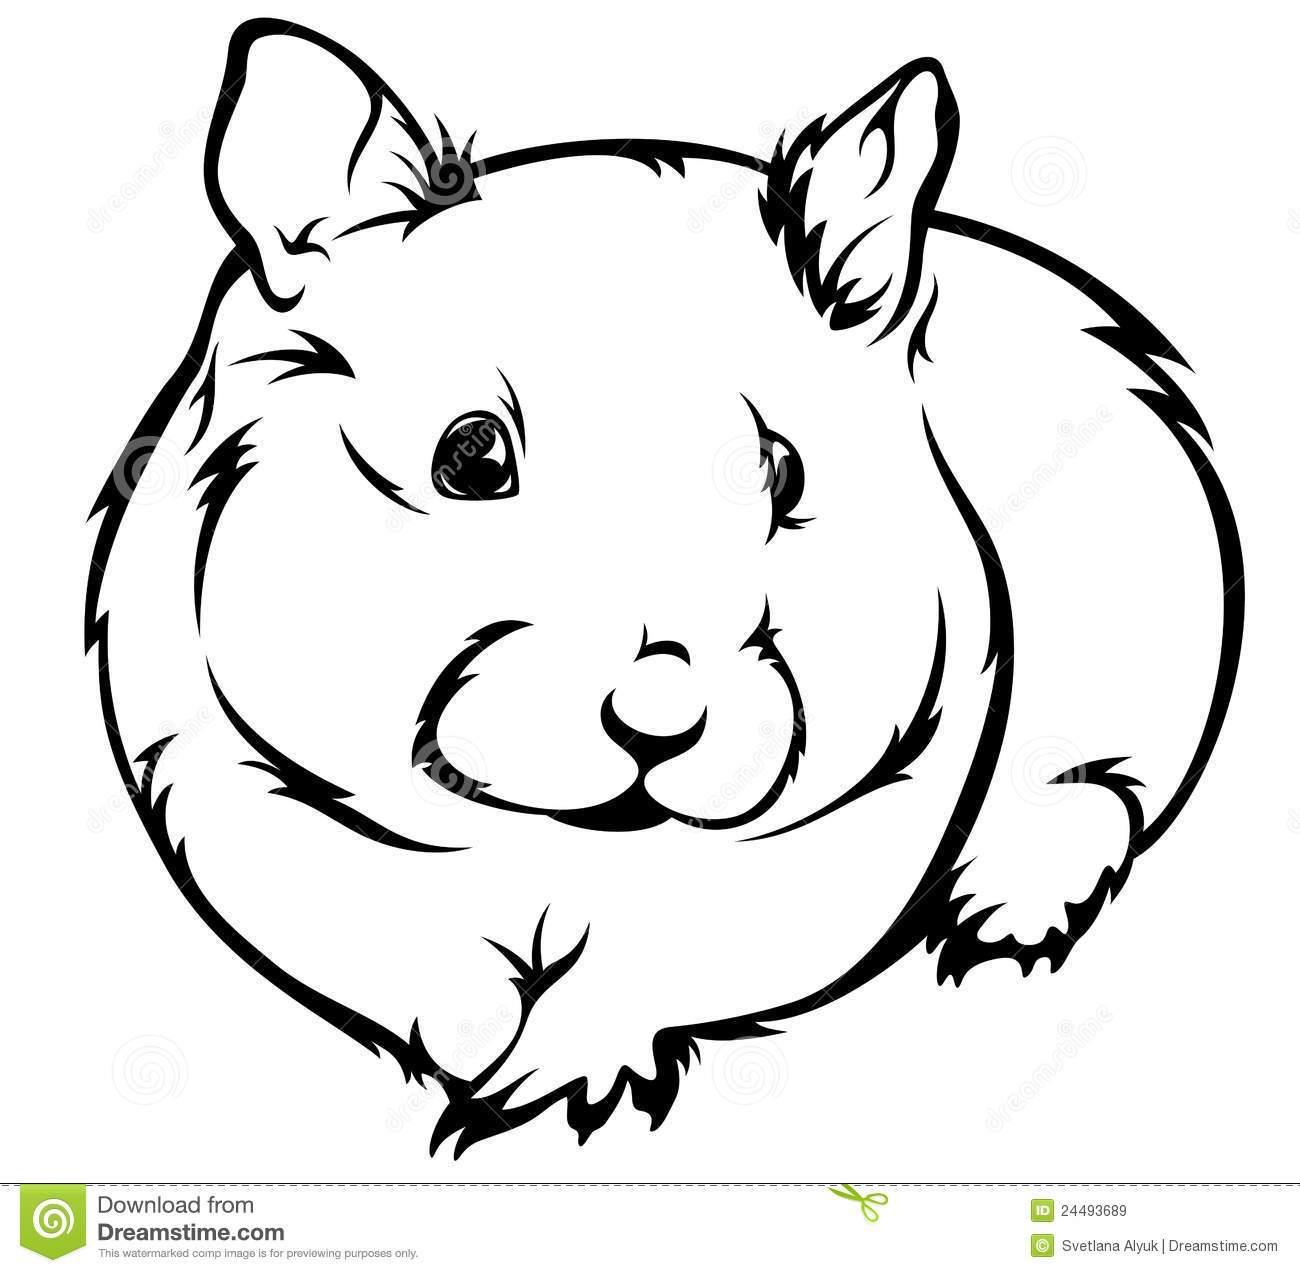 Black hamster clipart freeuse library Hamster clipart black and white 1 » Clipart Portal freeuse library